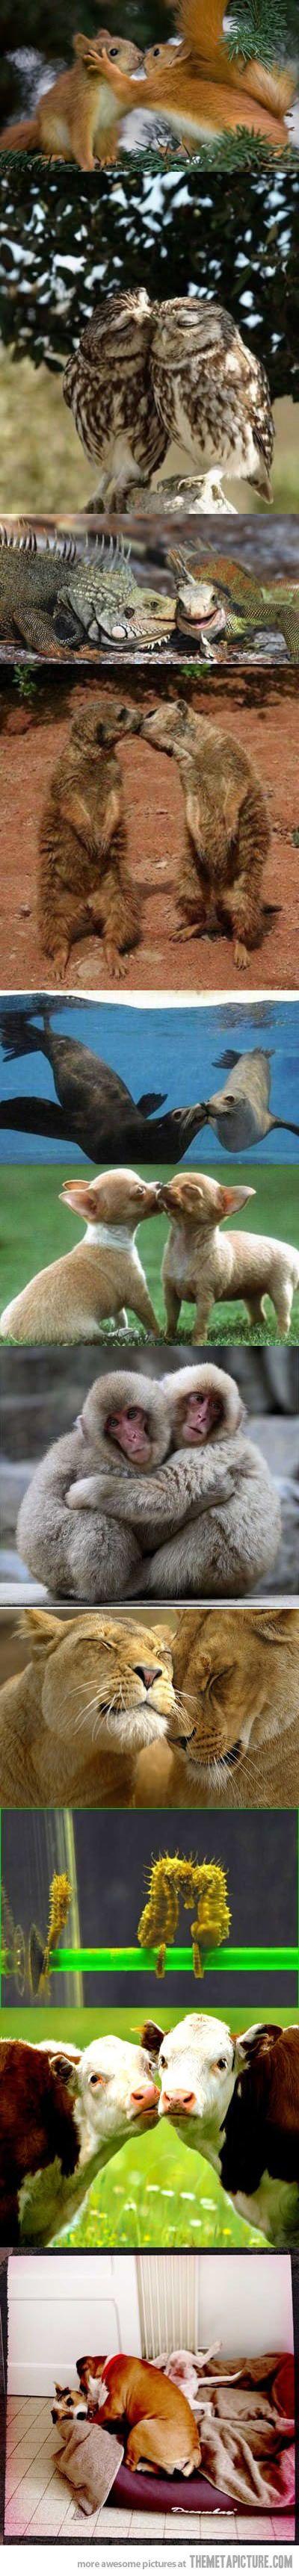 Love in nature